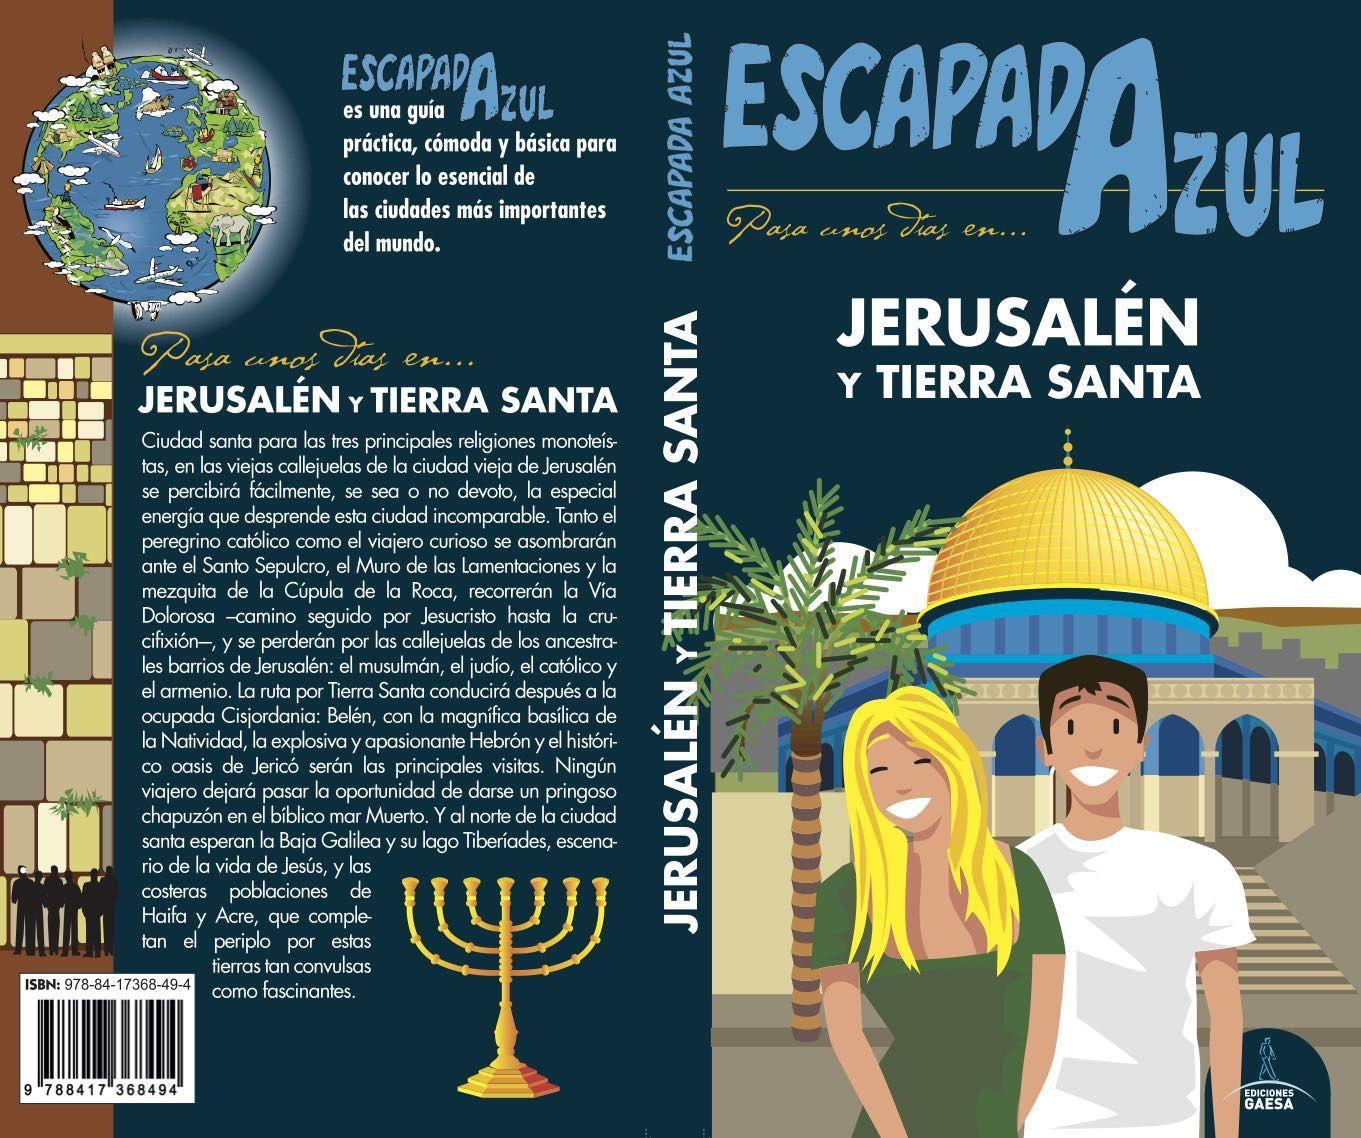 JERUSALÉN ESCAPADA AZUL